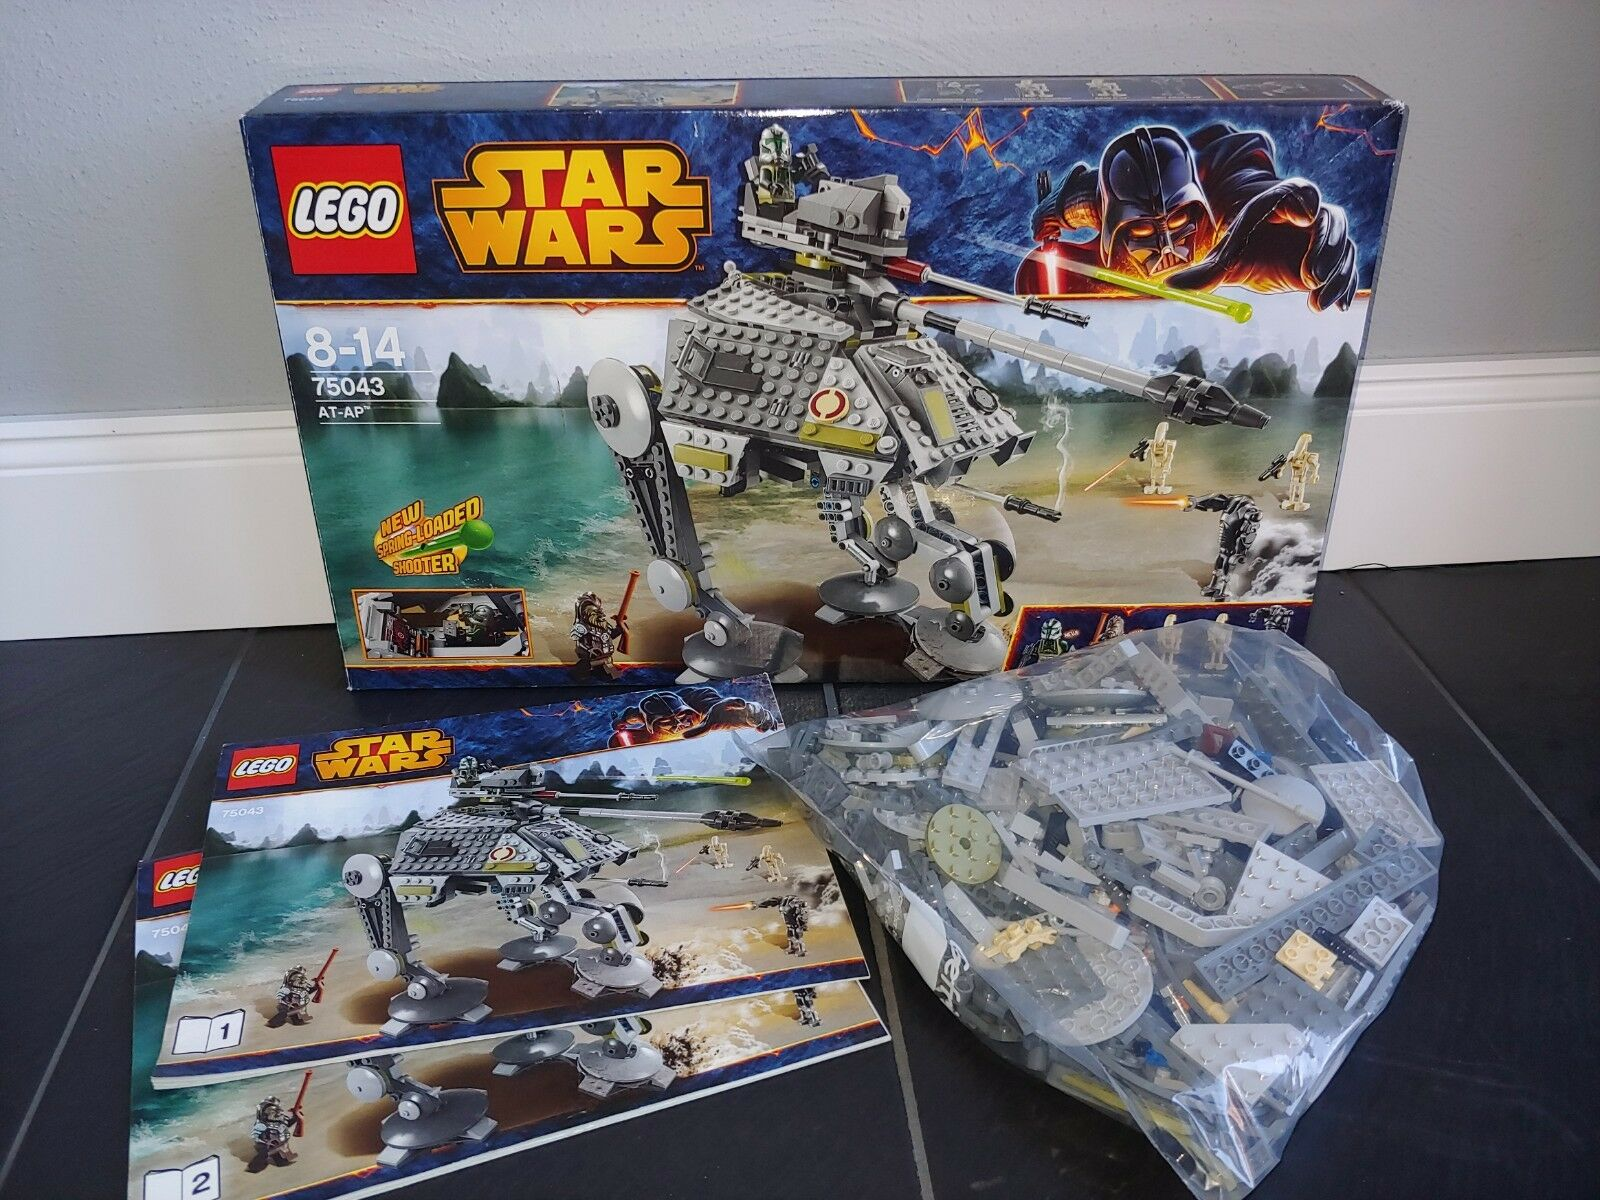 LEGO StarWars AT-AP (75043) in Ovp